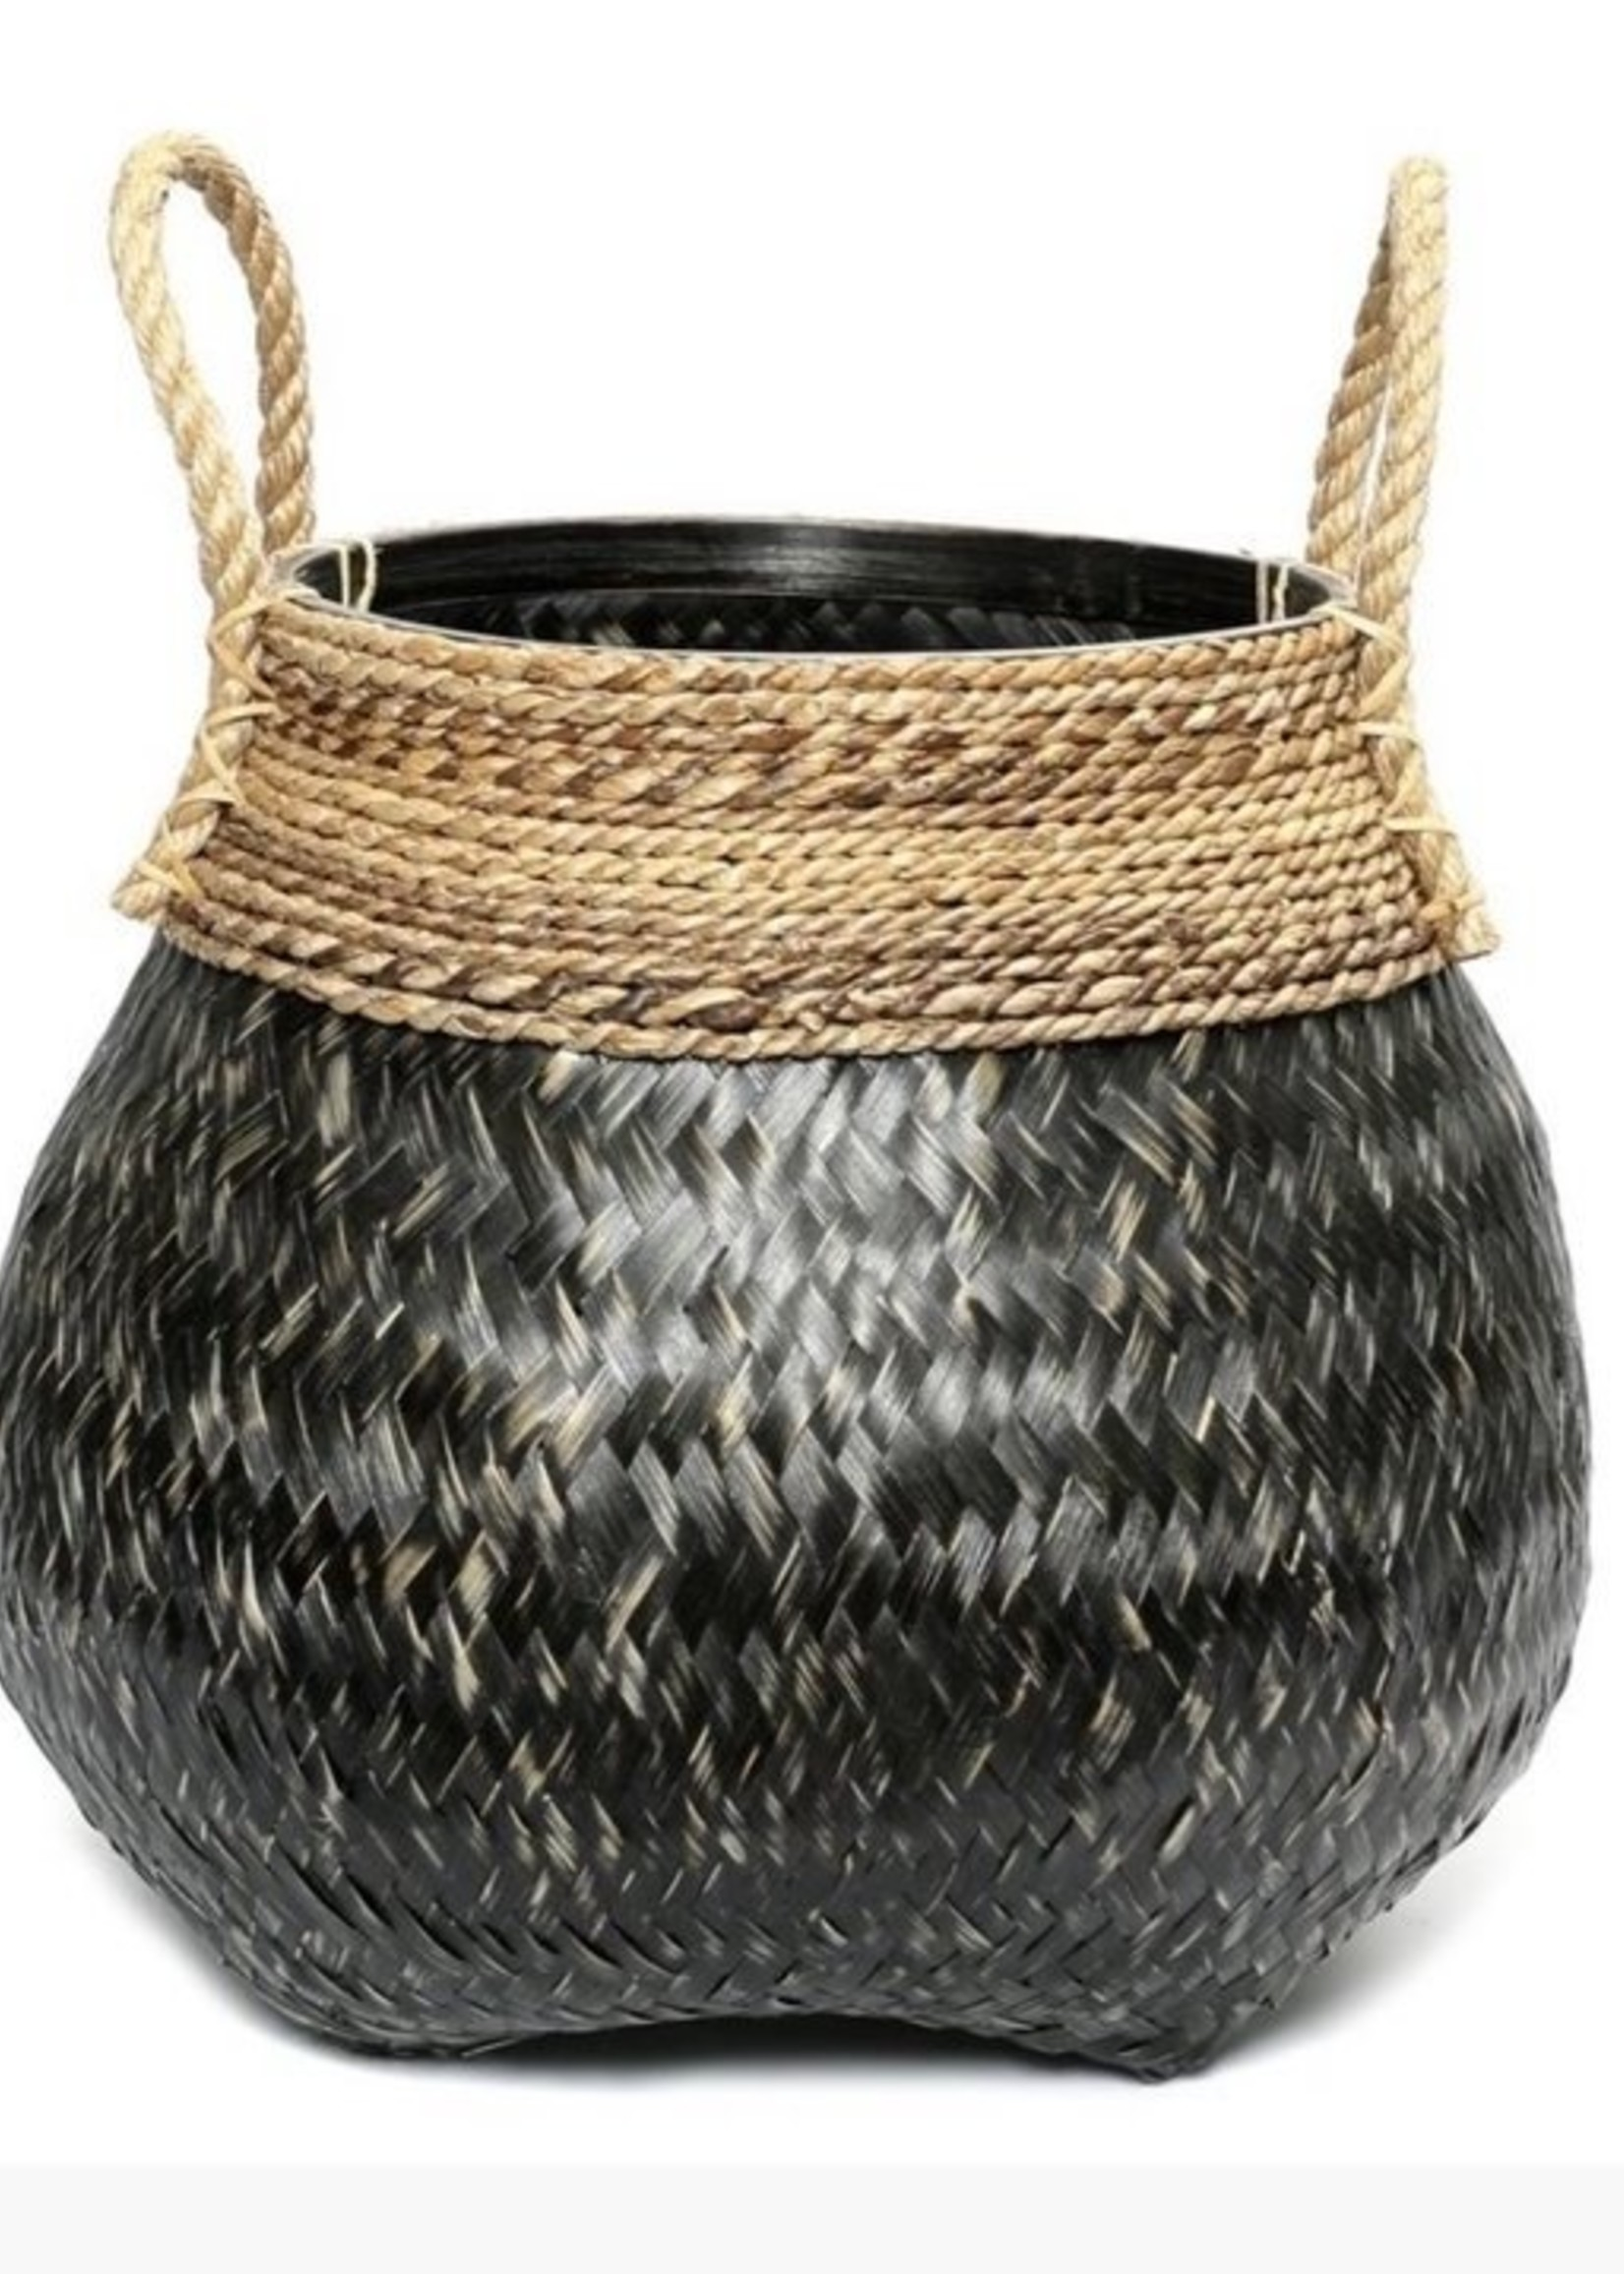 Guts & Goats The Belly Basket Black